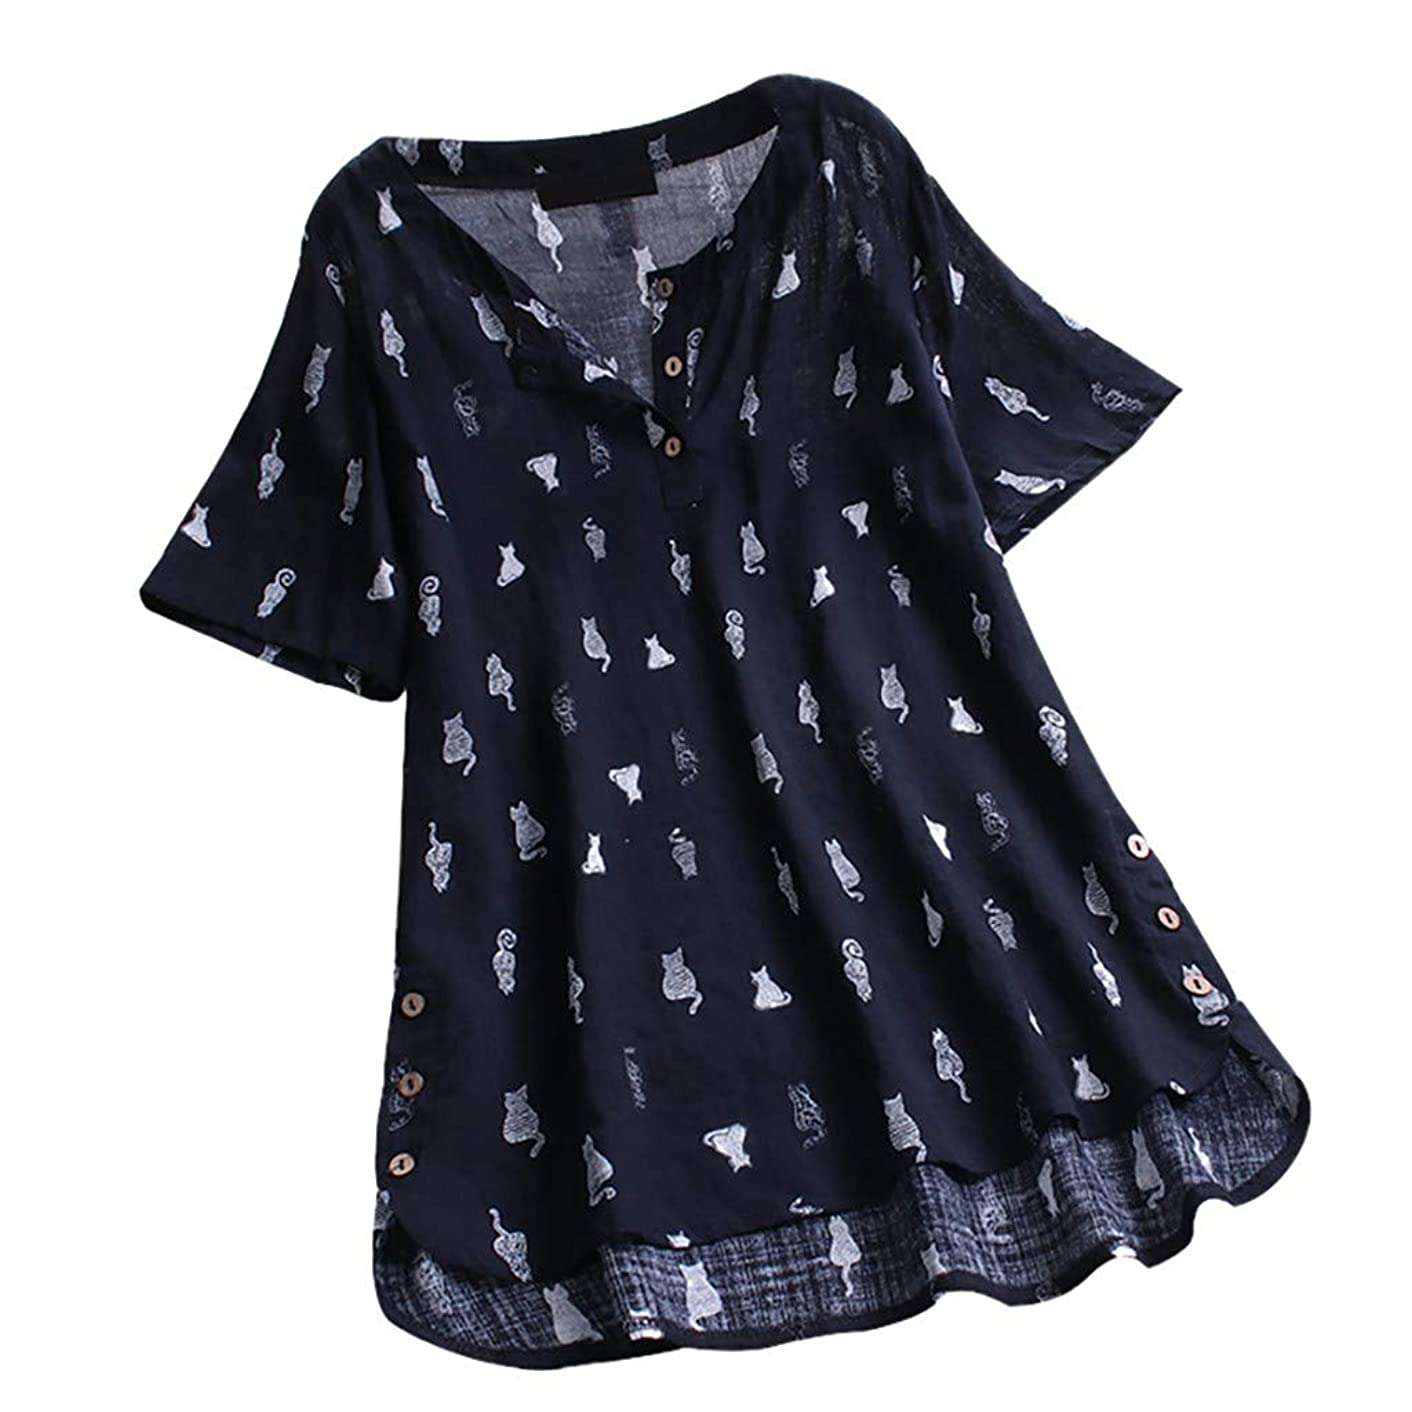 Claystyle Women Vintage V-Neck Casual Cat Print Button Plus Siz Top Blouse T-Shirt